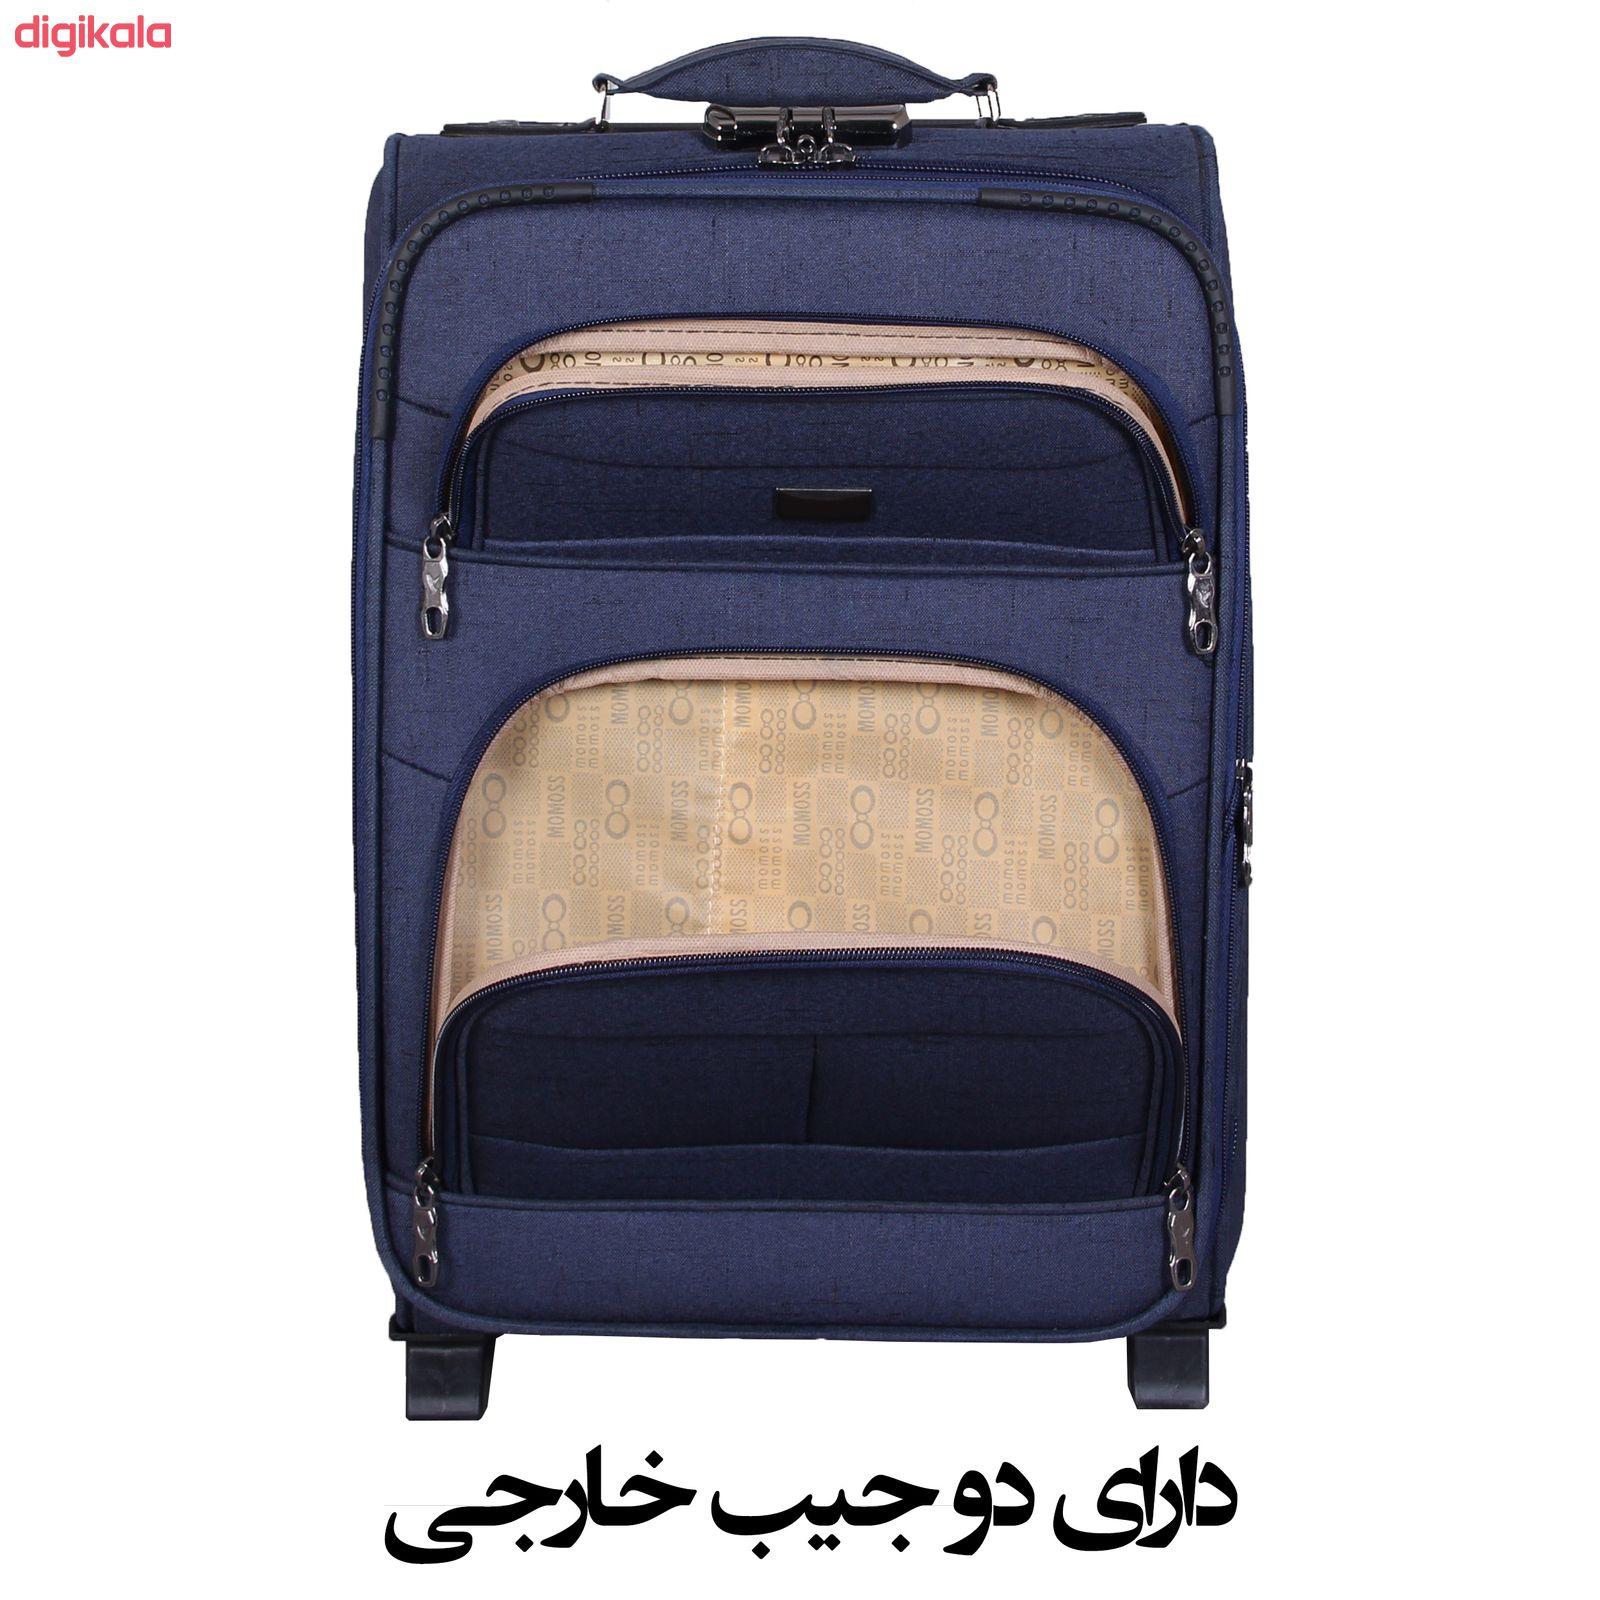 مجموعه سه عددی چمدان کد 2301A main 1 6